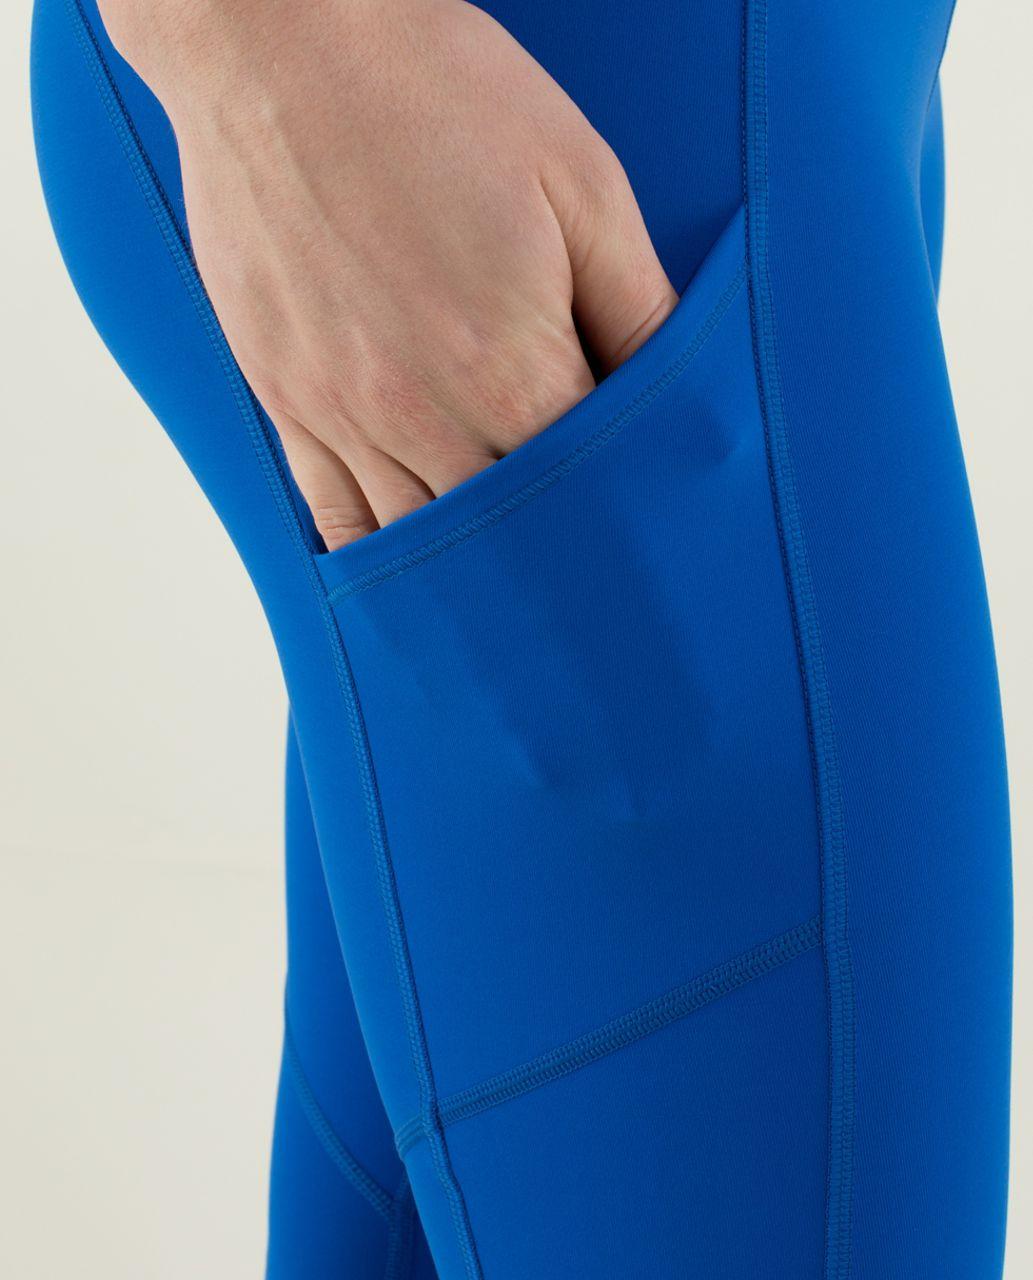 Lululemon Speed Tight *Brushed Interlock - Baroque Blue / Mini Hyper Stripe Baroque Blue